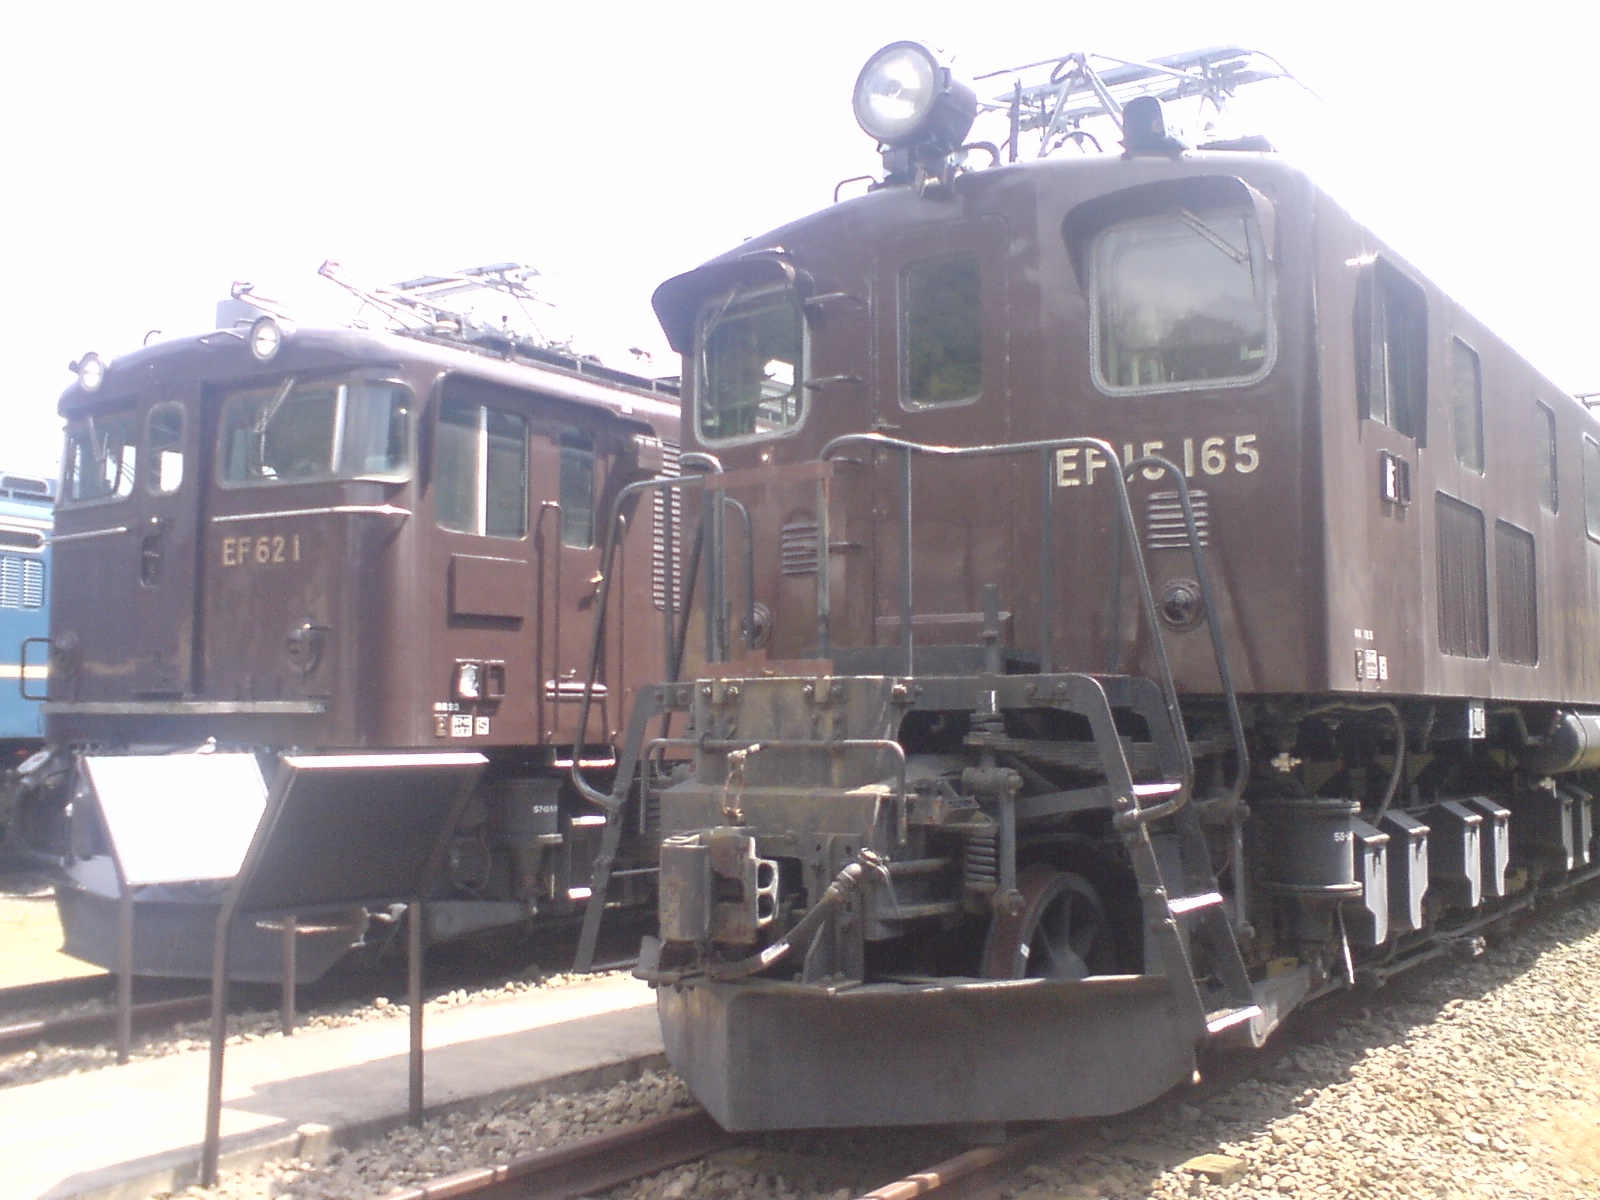 Kc380068